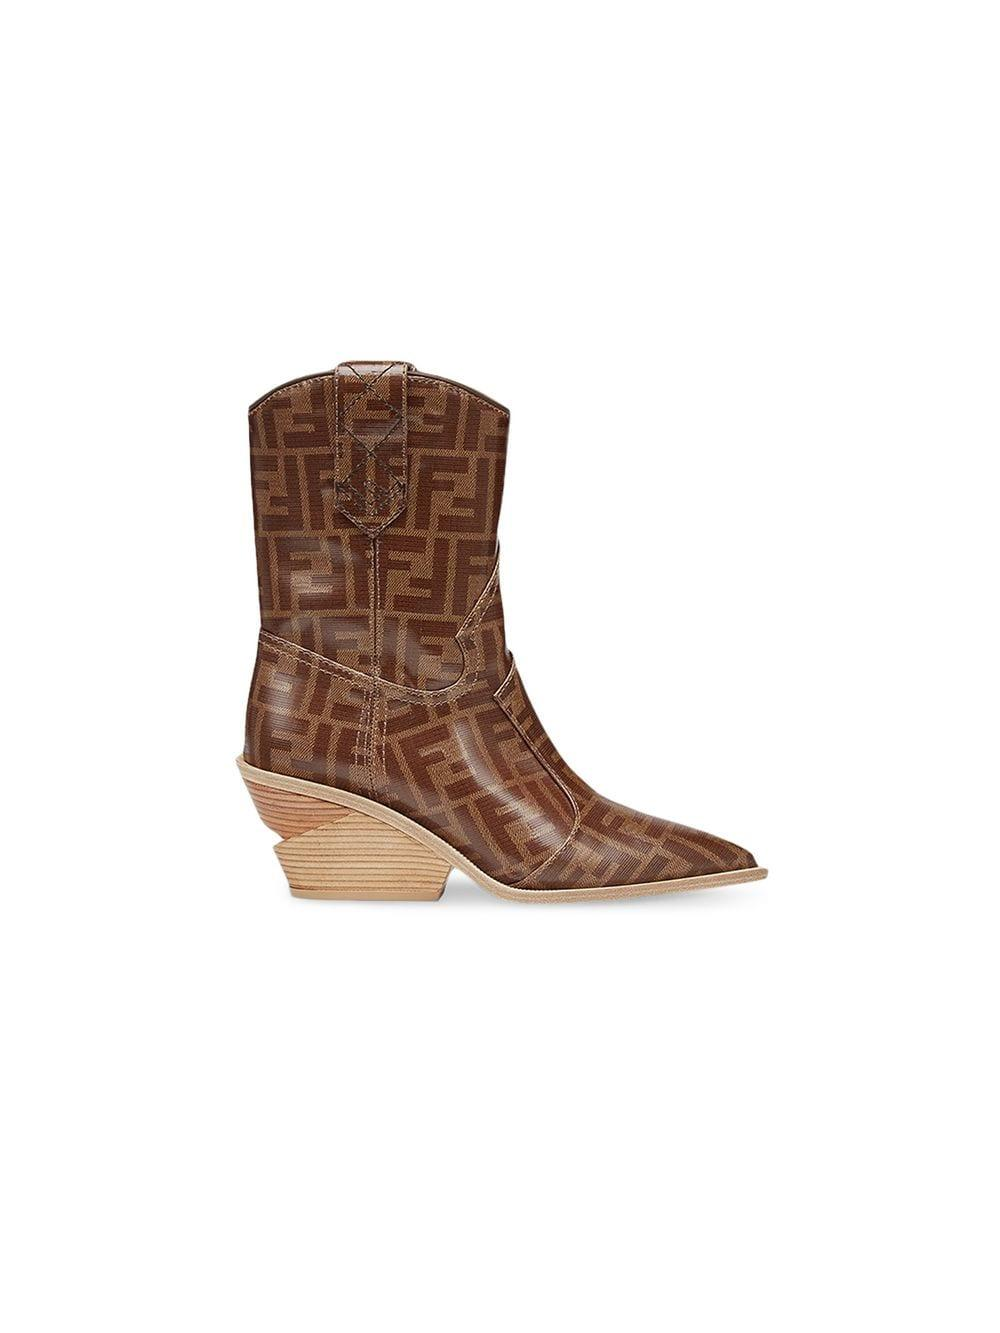 Fendi Pointed Toe Cowboy Booties in